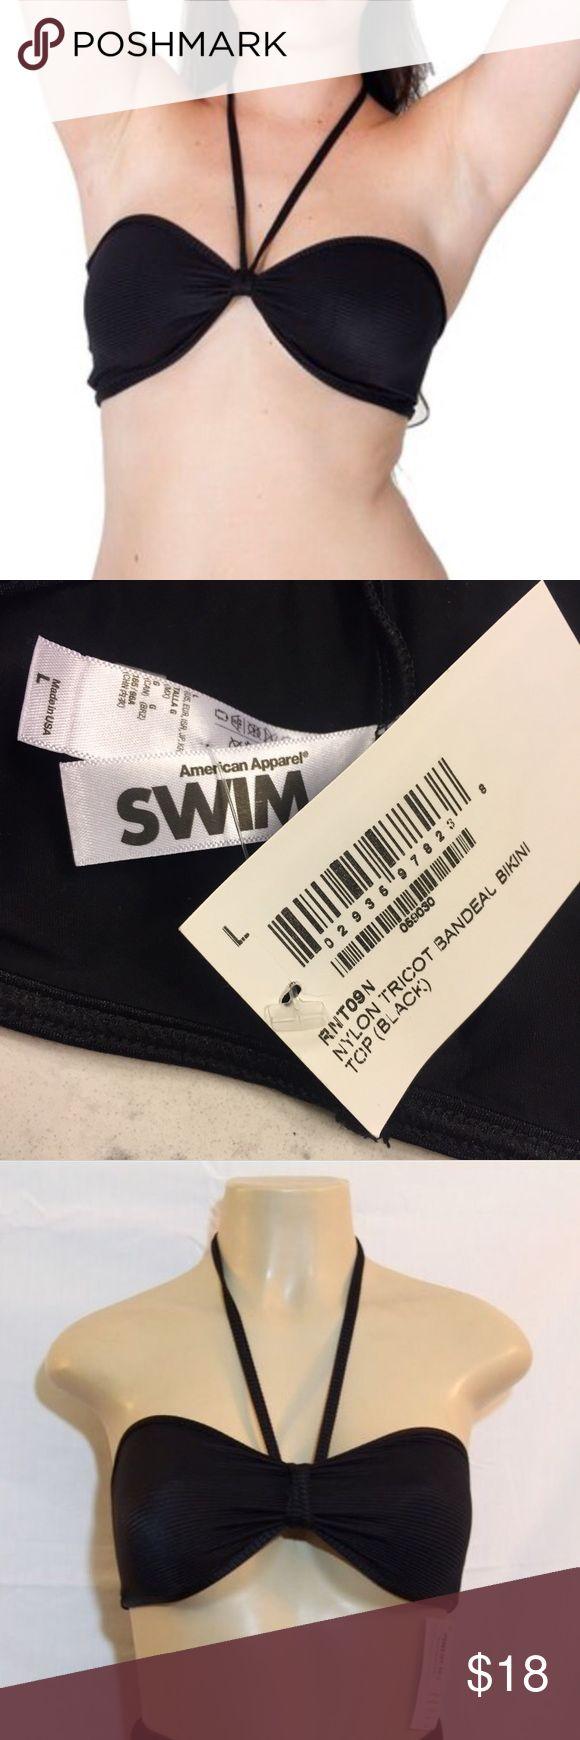 American Apparel Black Bandeau Bikini Top - SIZE L NWT! SOLD OUT - black American Apparel classic bandeau bikini top! Absolutely PERFECT for POOL SEASON!  • Nylon Tricot (80% Nylon / 20% Elastane)   • Removable bandeau spaghetti ties, can we worn as tube top bikini top also! American Apparel Swim Bikinis